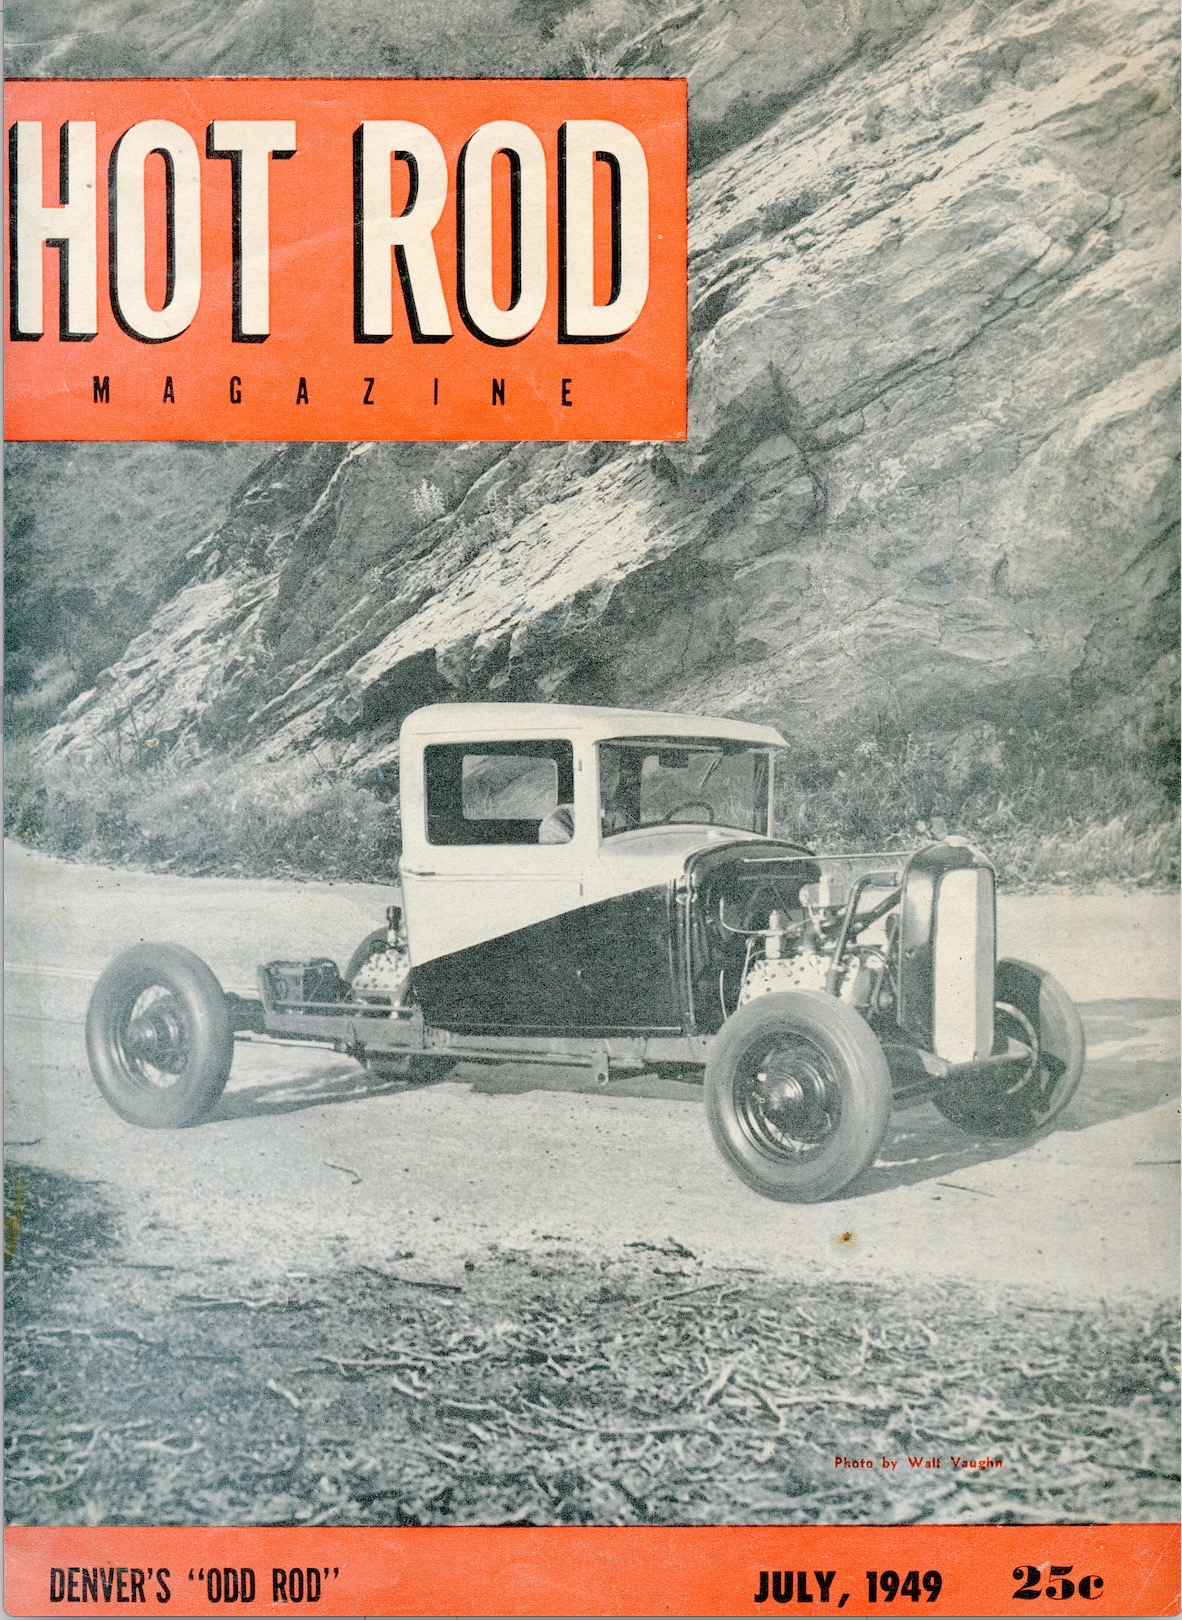 Odd Rod Hot Rod Magazine cover July 1949